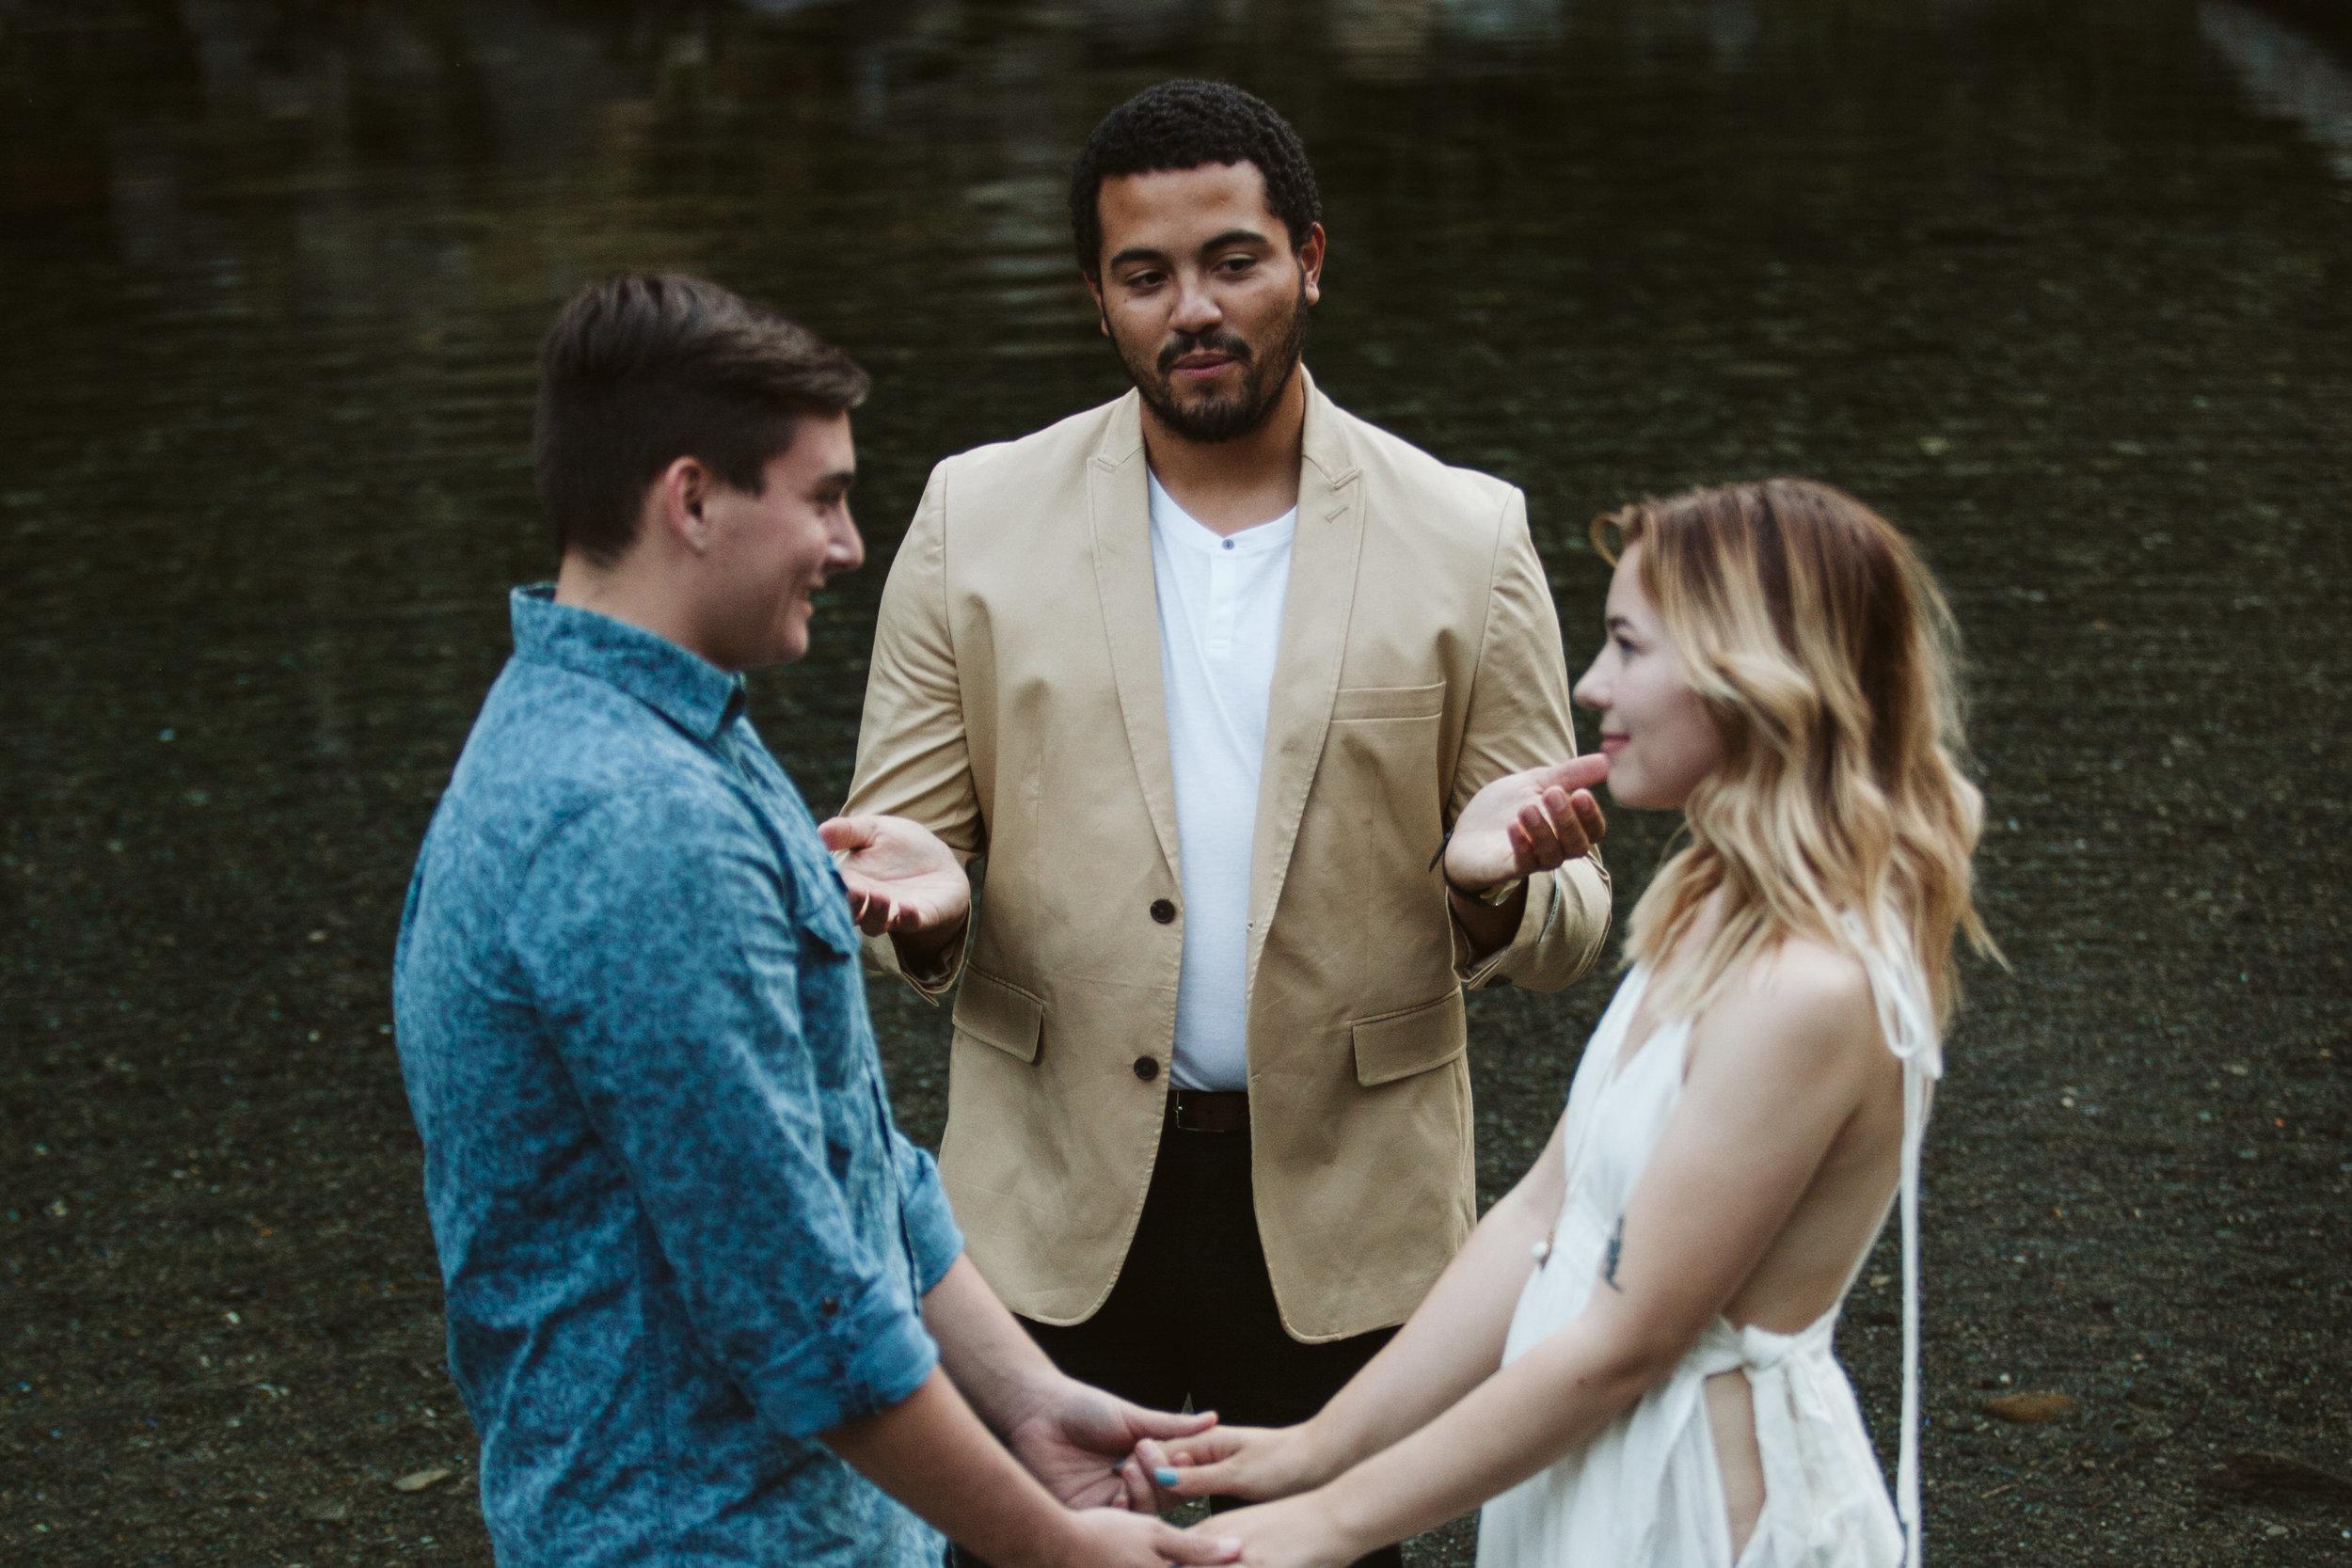 Hannah&Ben_Redwoods_Elopement_Engagement_PNW_SouthernOregon_NorthernCalifornia_ (15 of 23).jpg